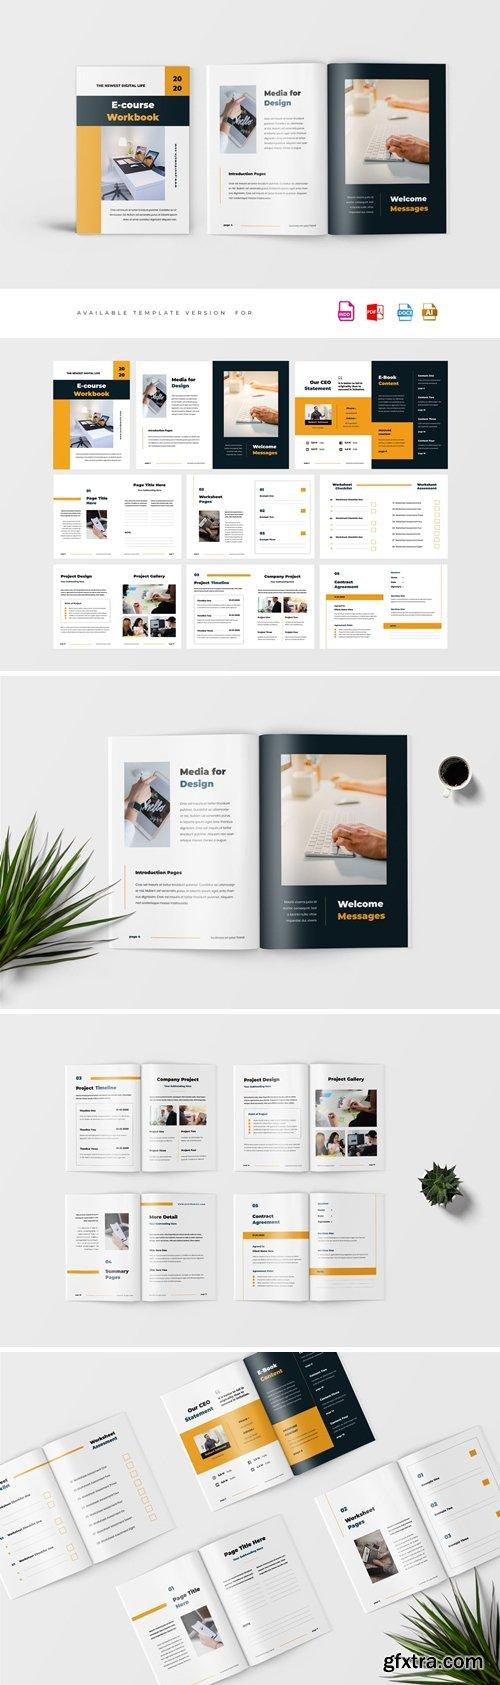 CreativeMarket - eCourse Workbook Template 4084778